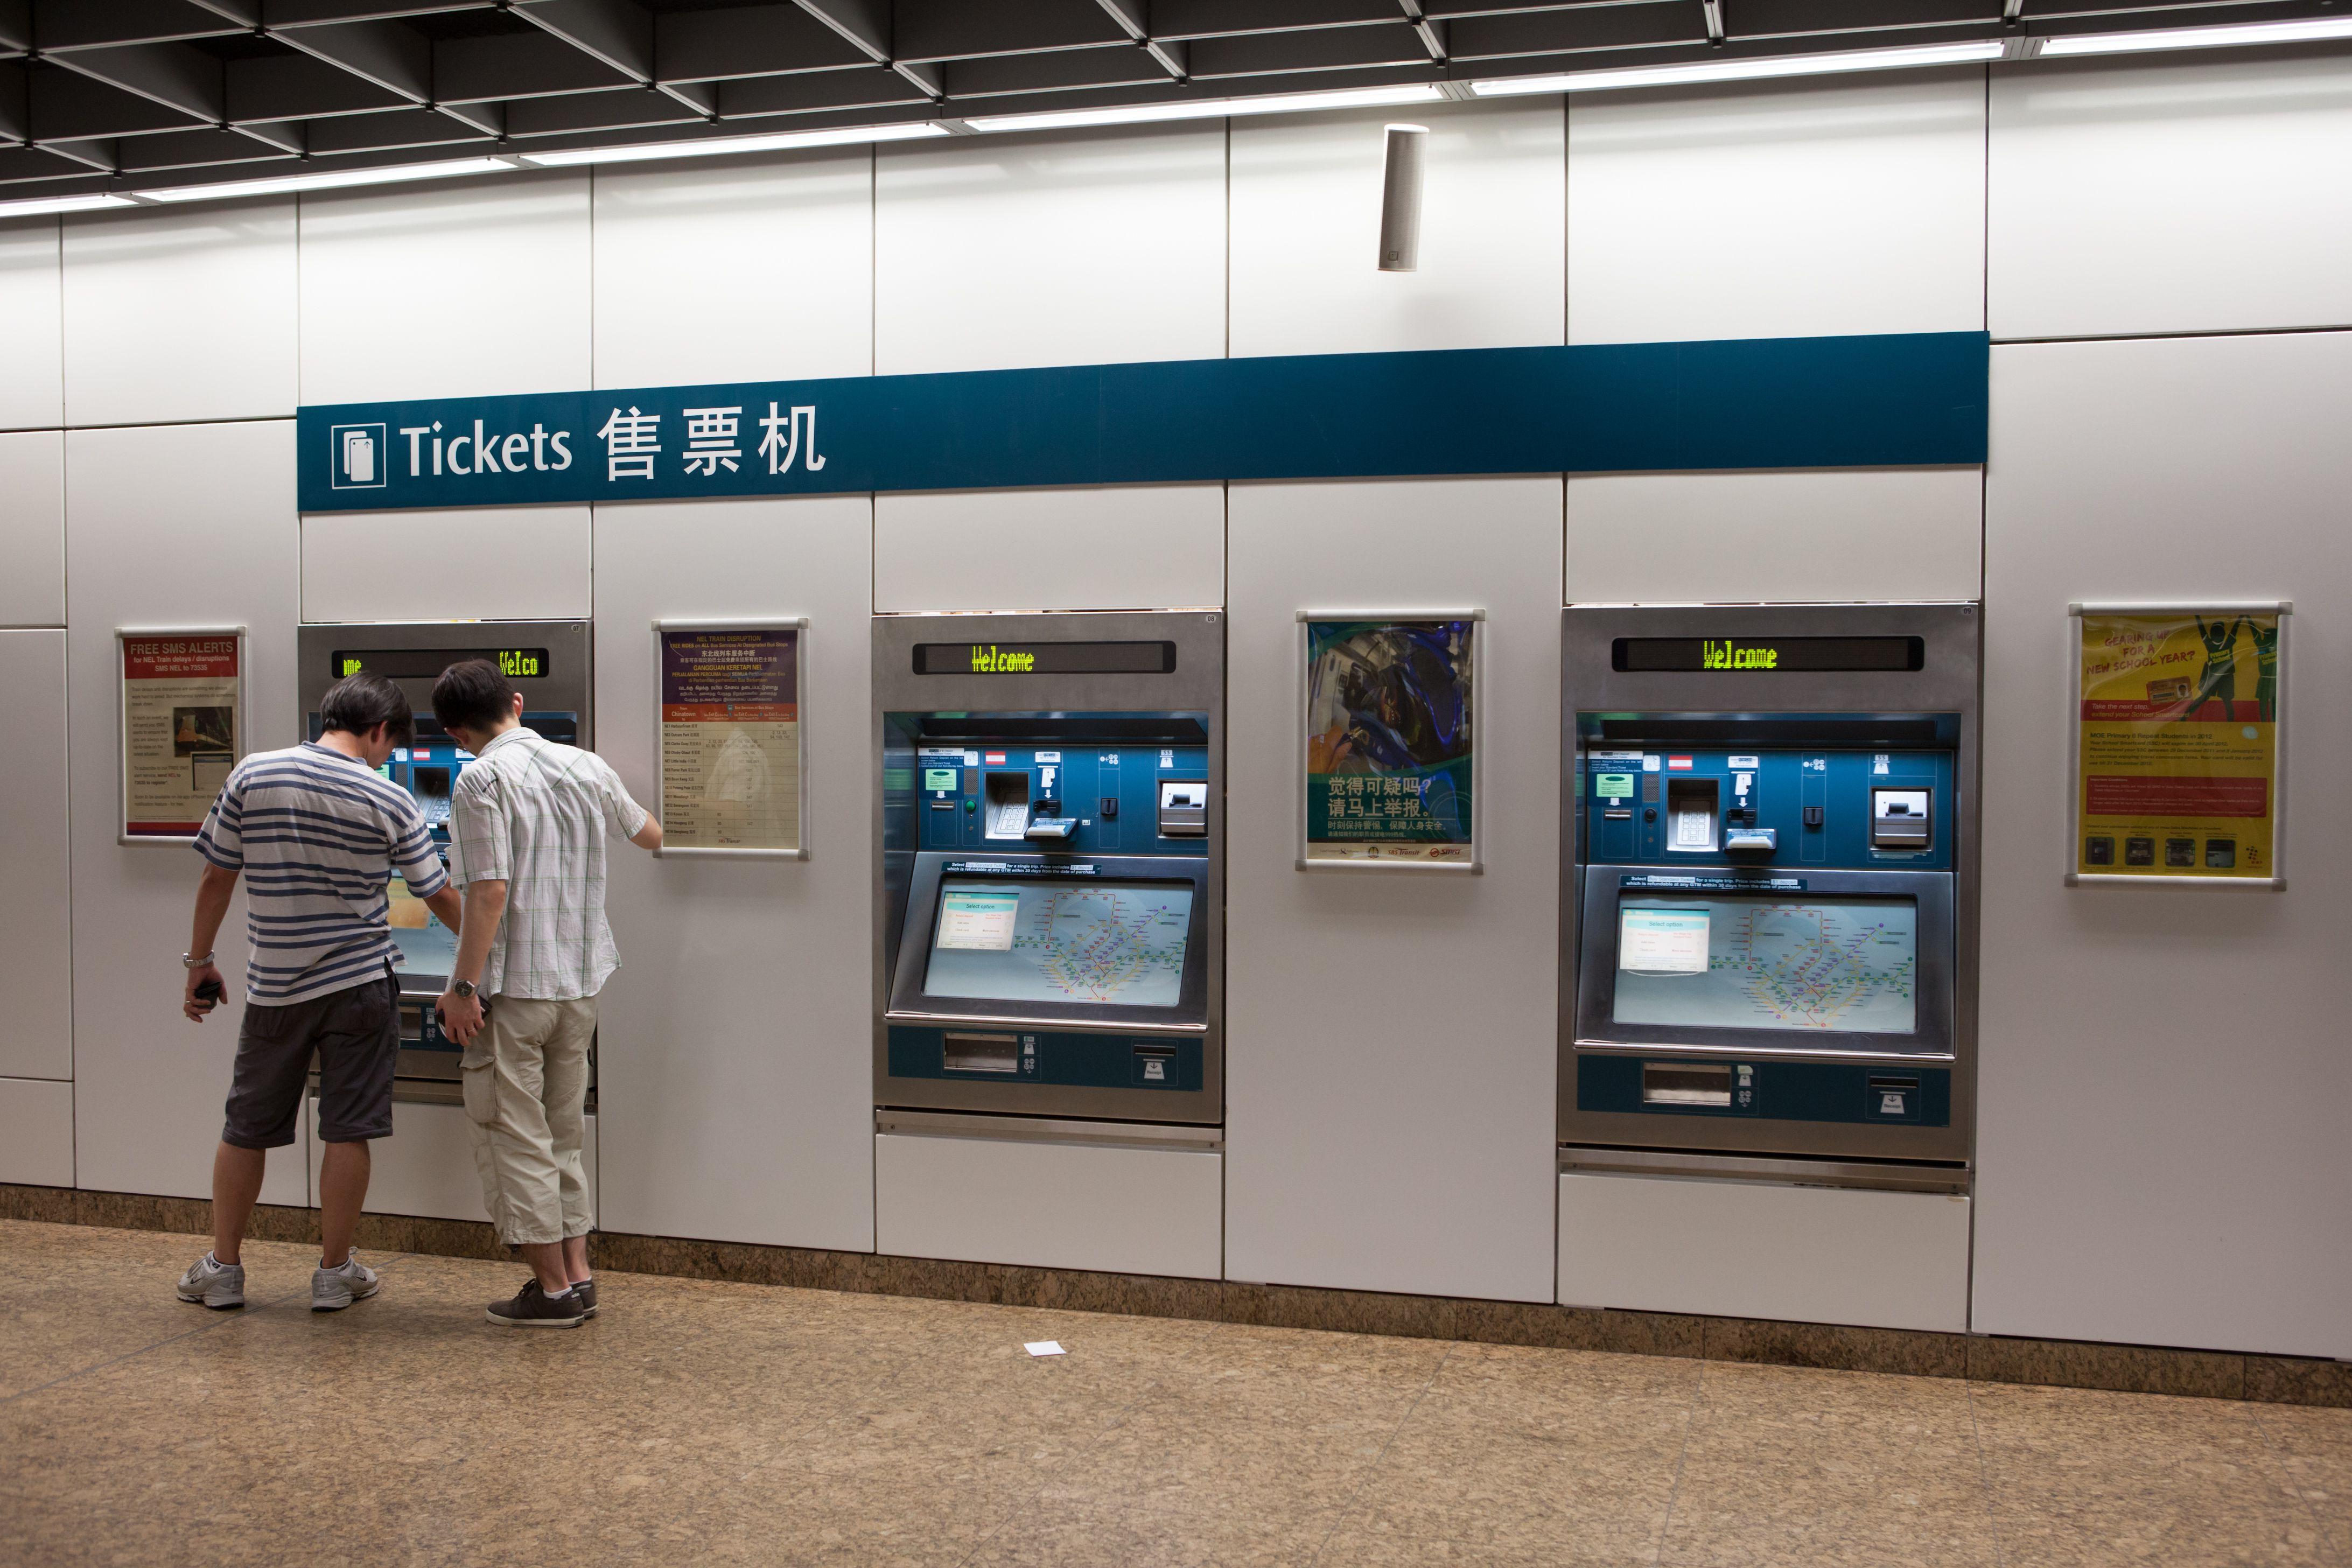 Singapore on a Budget: 10 Ways to Save Money